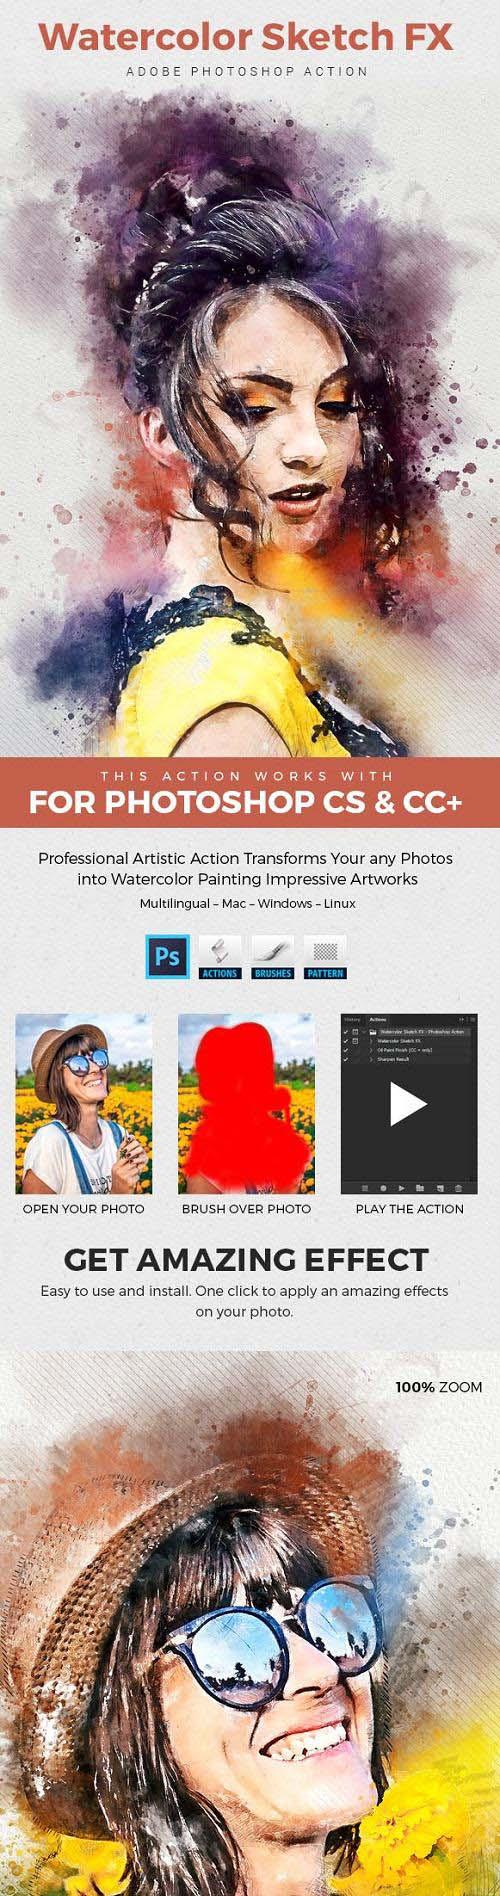 Watercolor Sketch FX - Photoshop Action 23729628